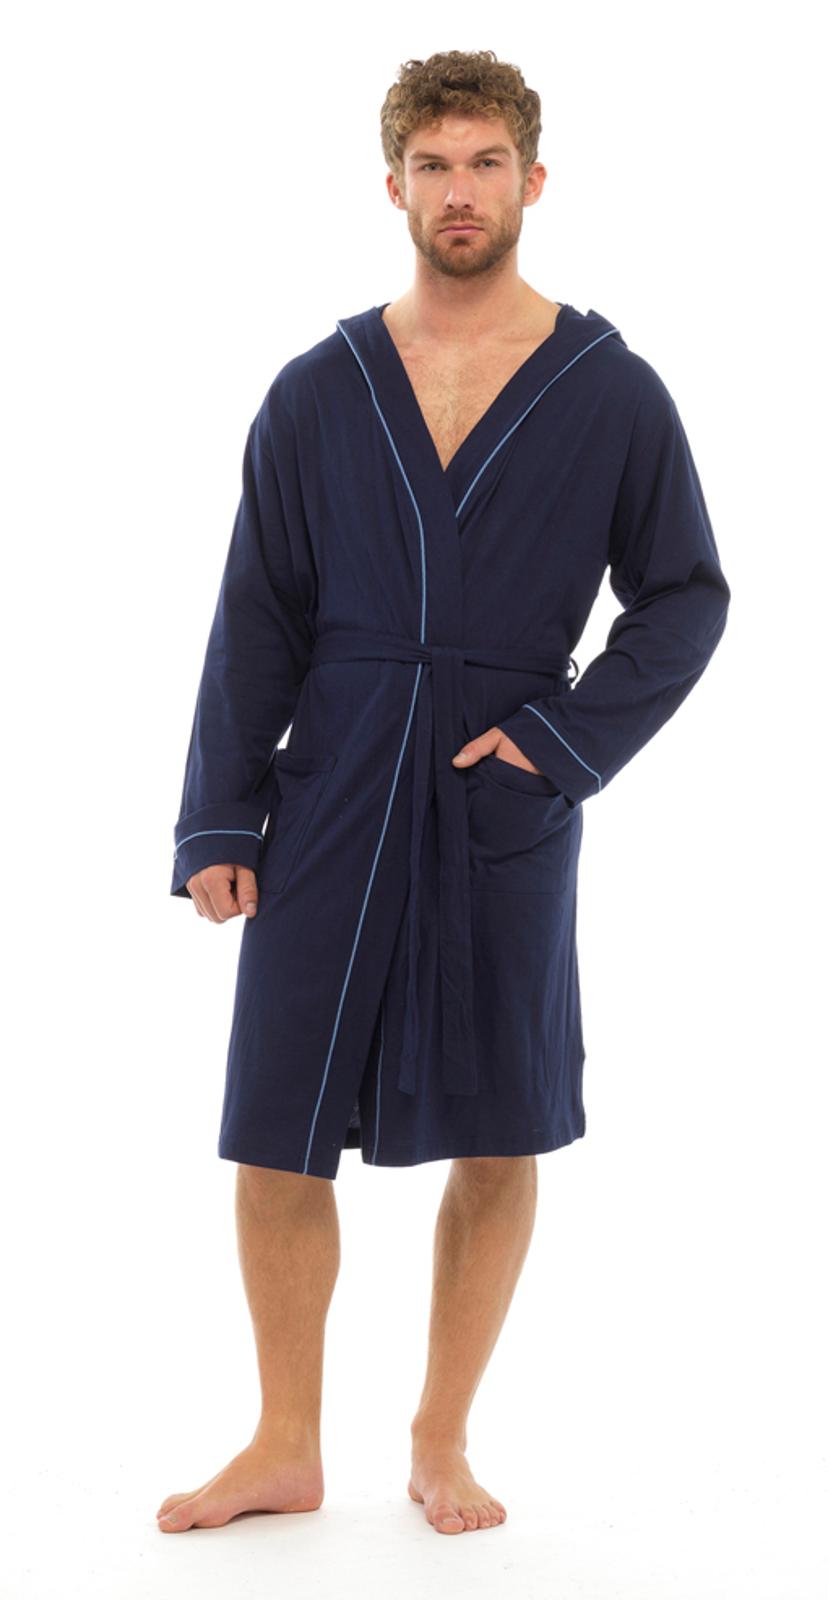 Mens Lightweight Hooded Robe Summer Dressing Gown 100 Cotton